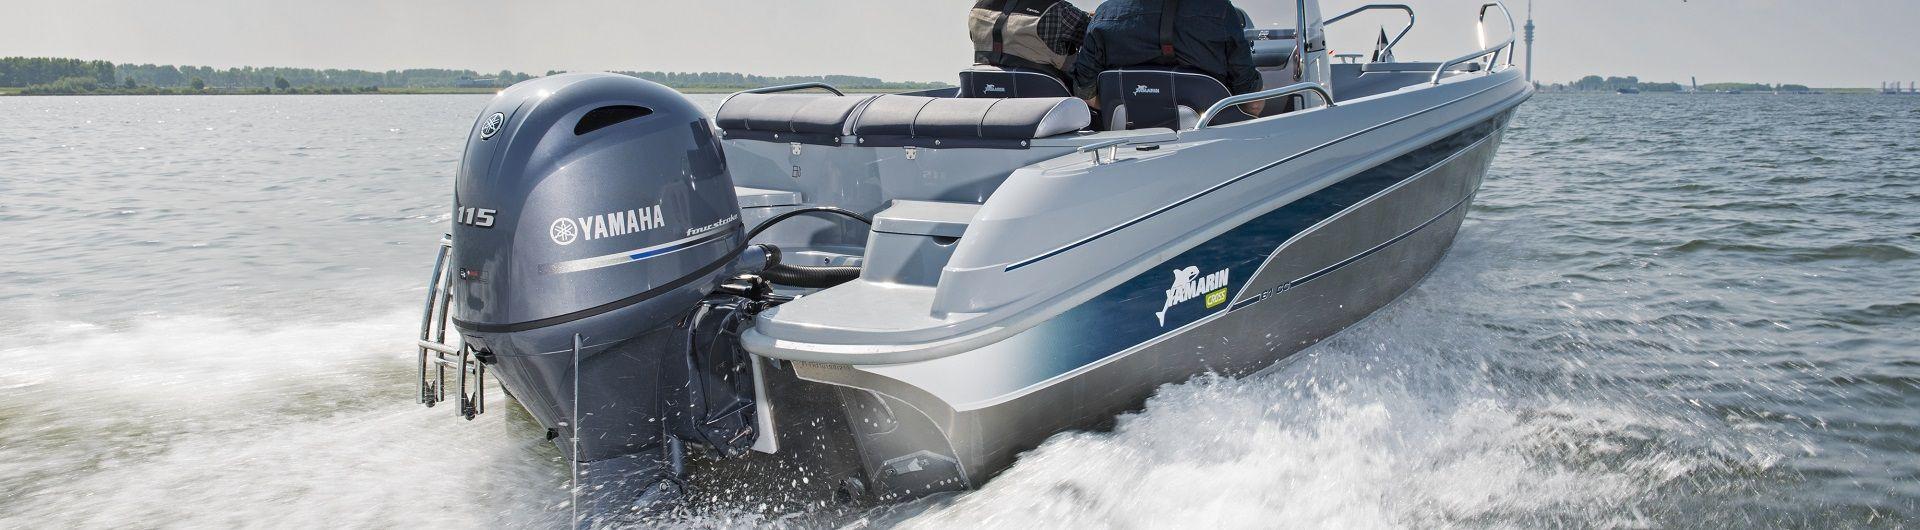 Yamaha Aussenbordmotor Header